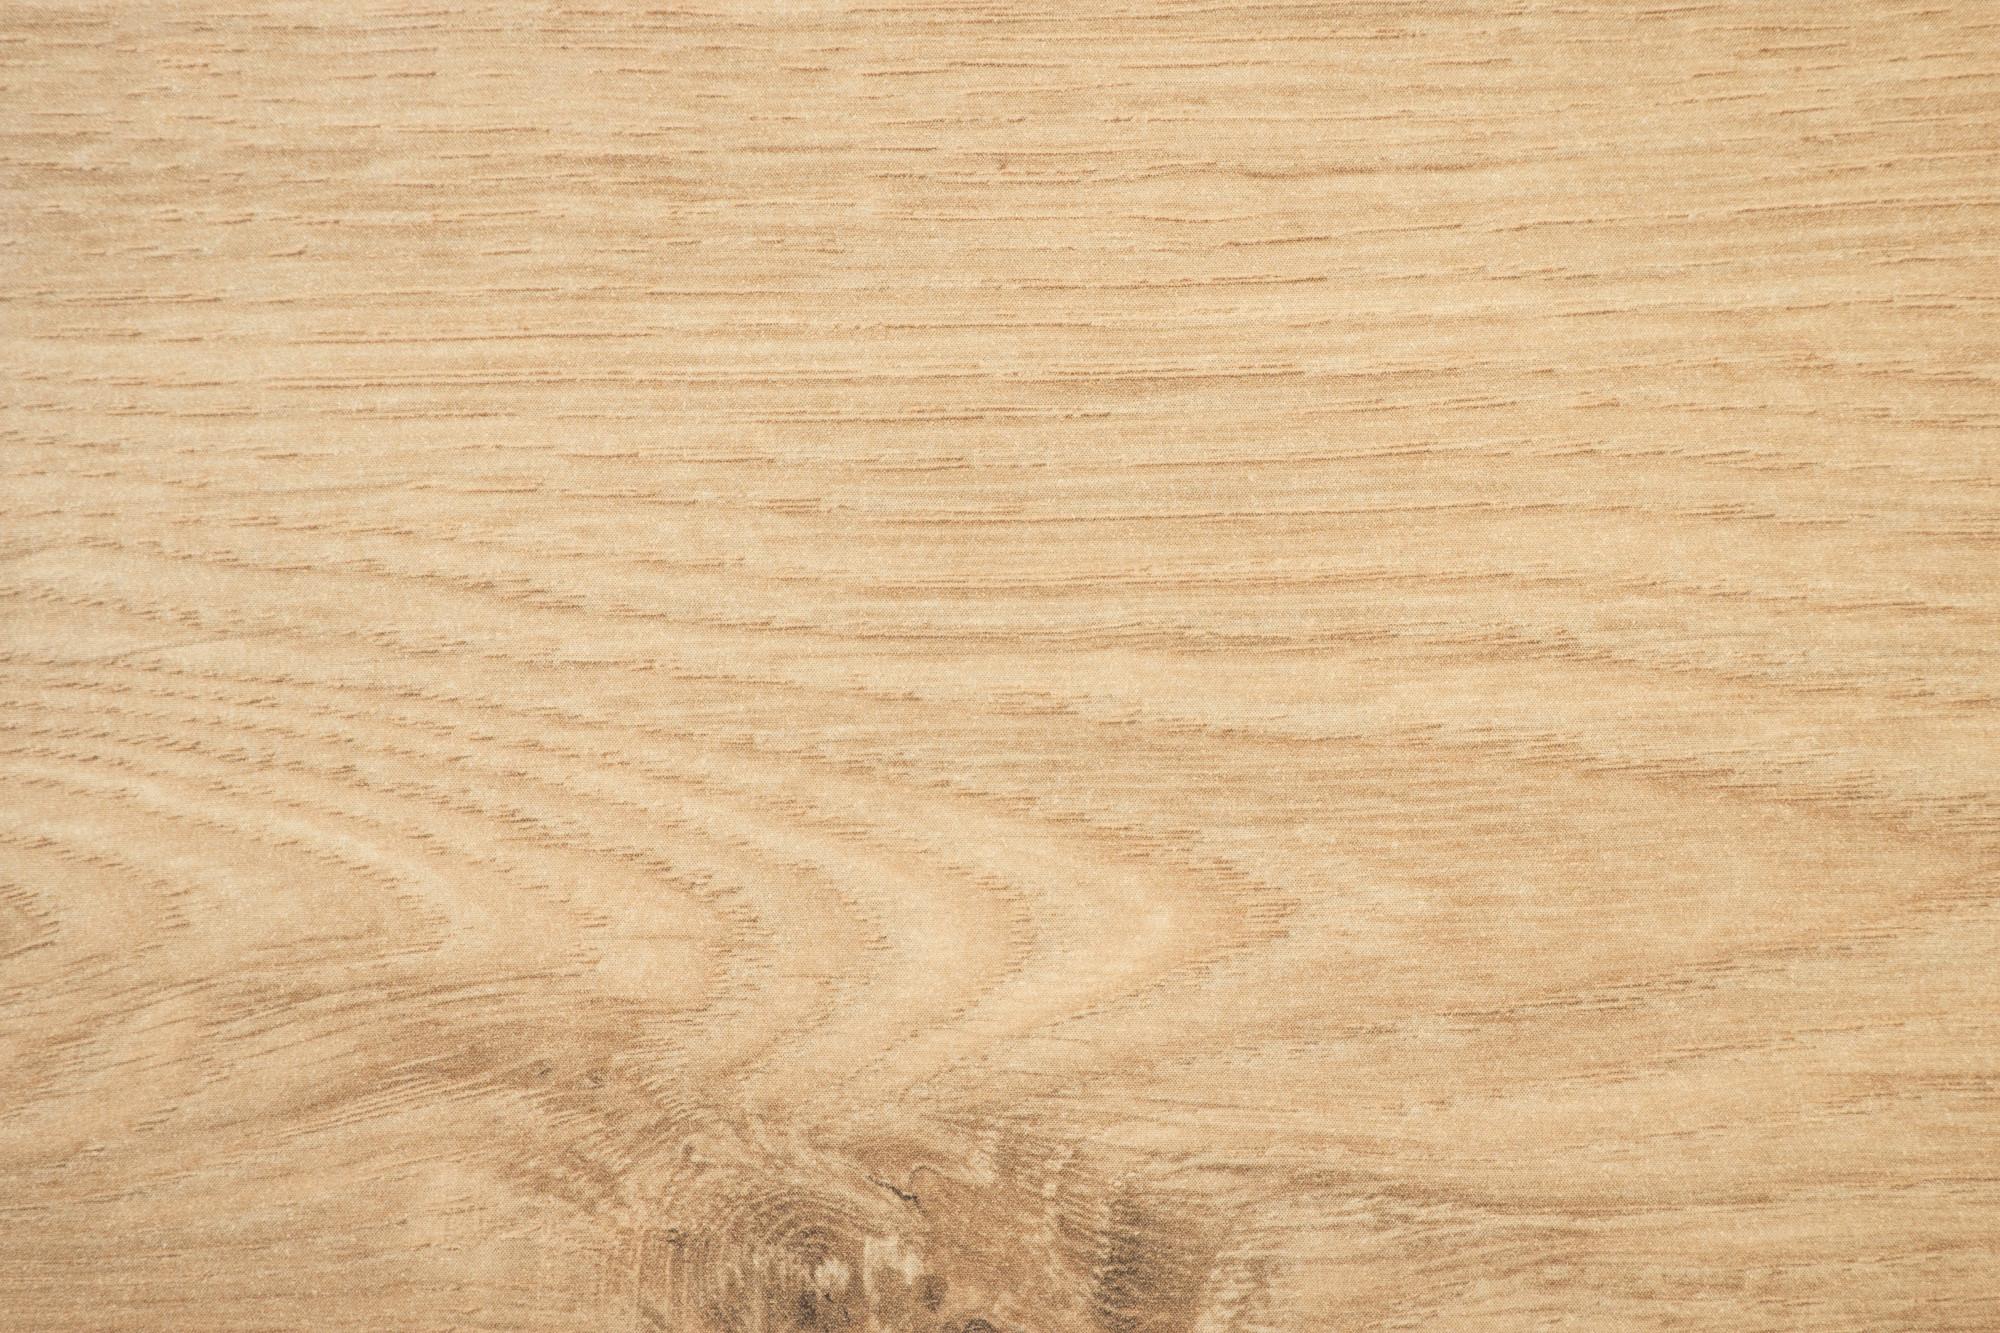 Massief eiken houten vloerdelen standaard bosbouw 20 mm inside